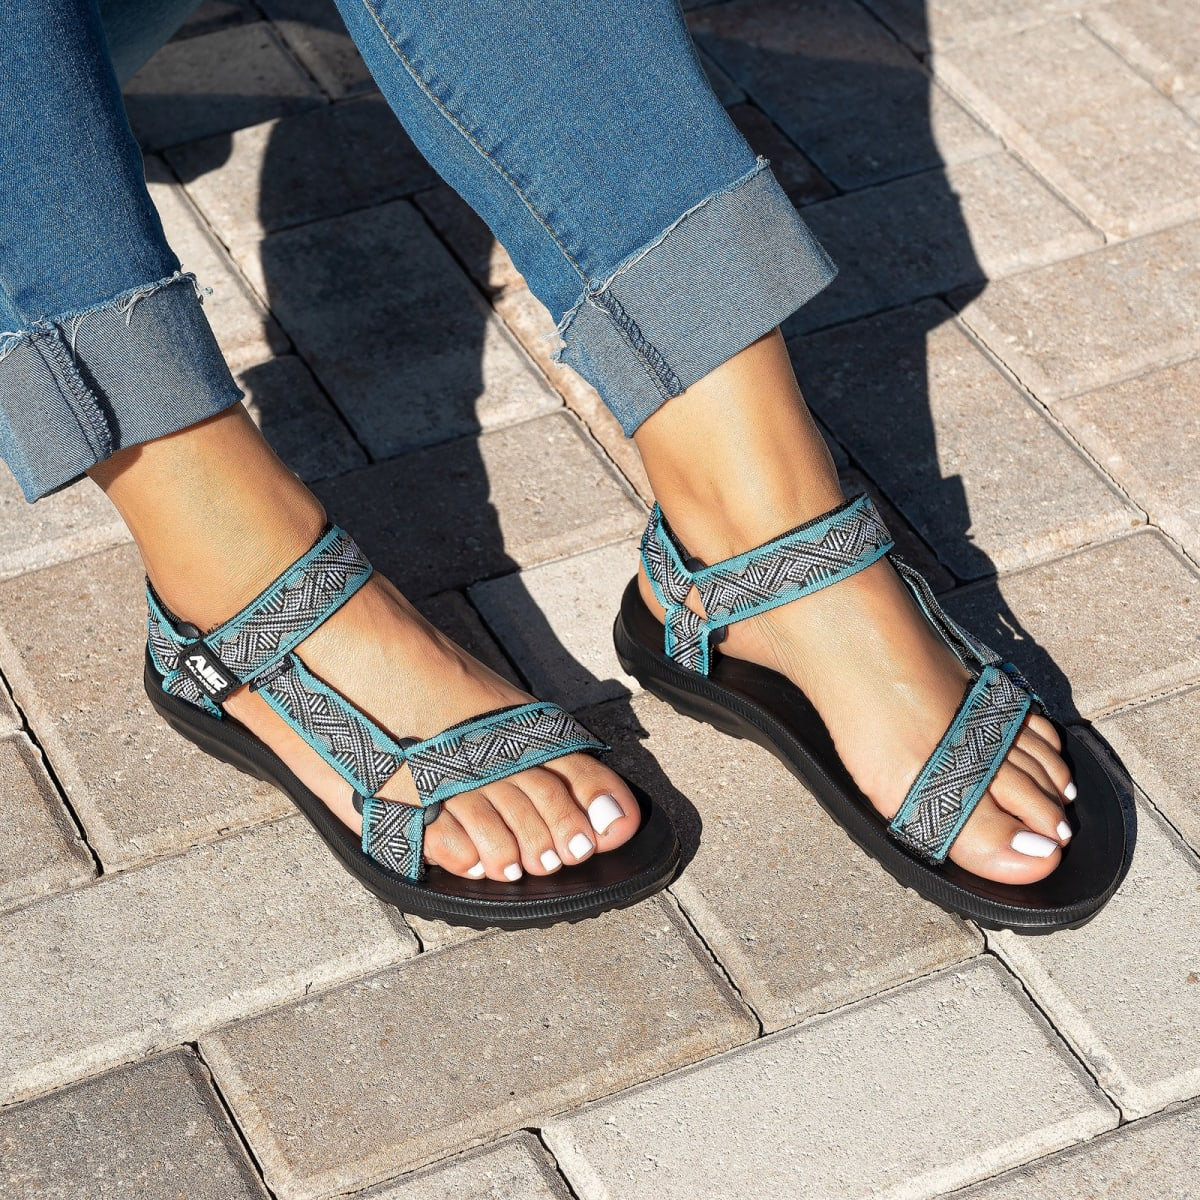 Seaview Velcro Strap Sandals